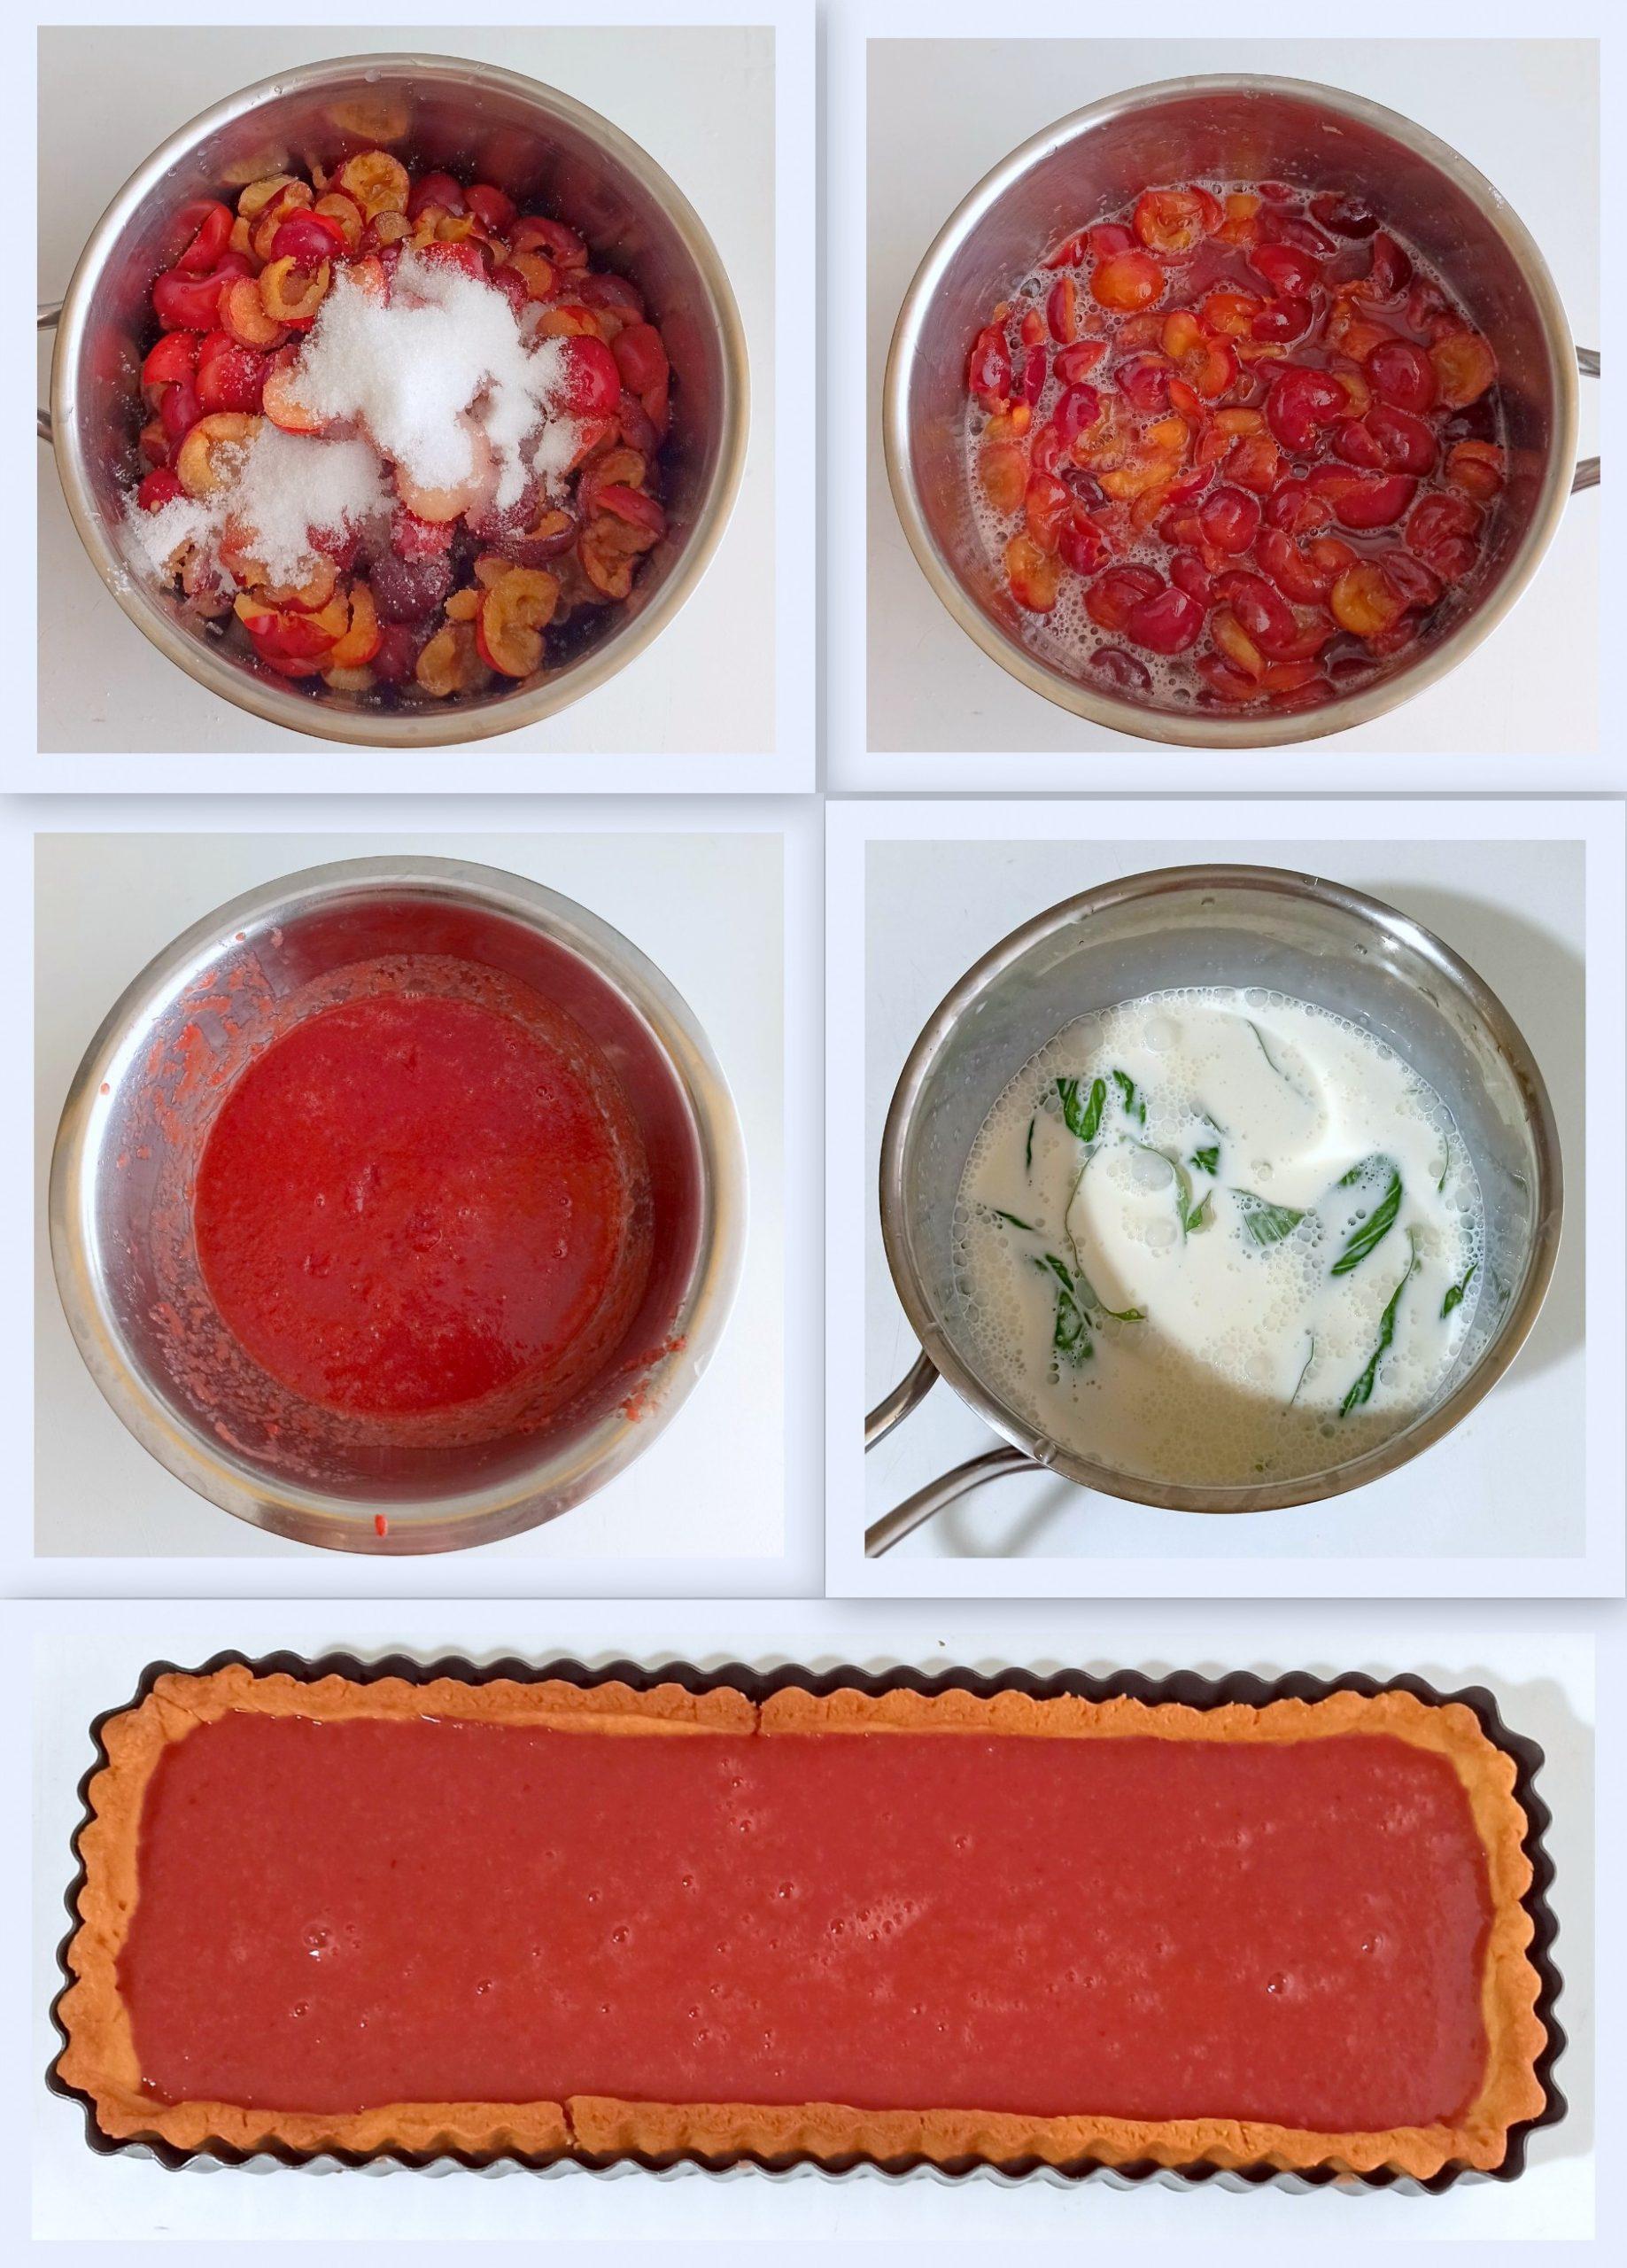 Tarte avec cerises et panna cotta sans gluten - La Cassata Celiaca